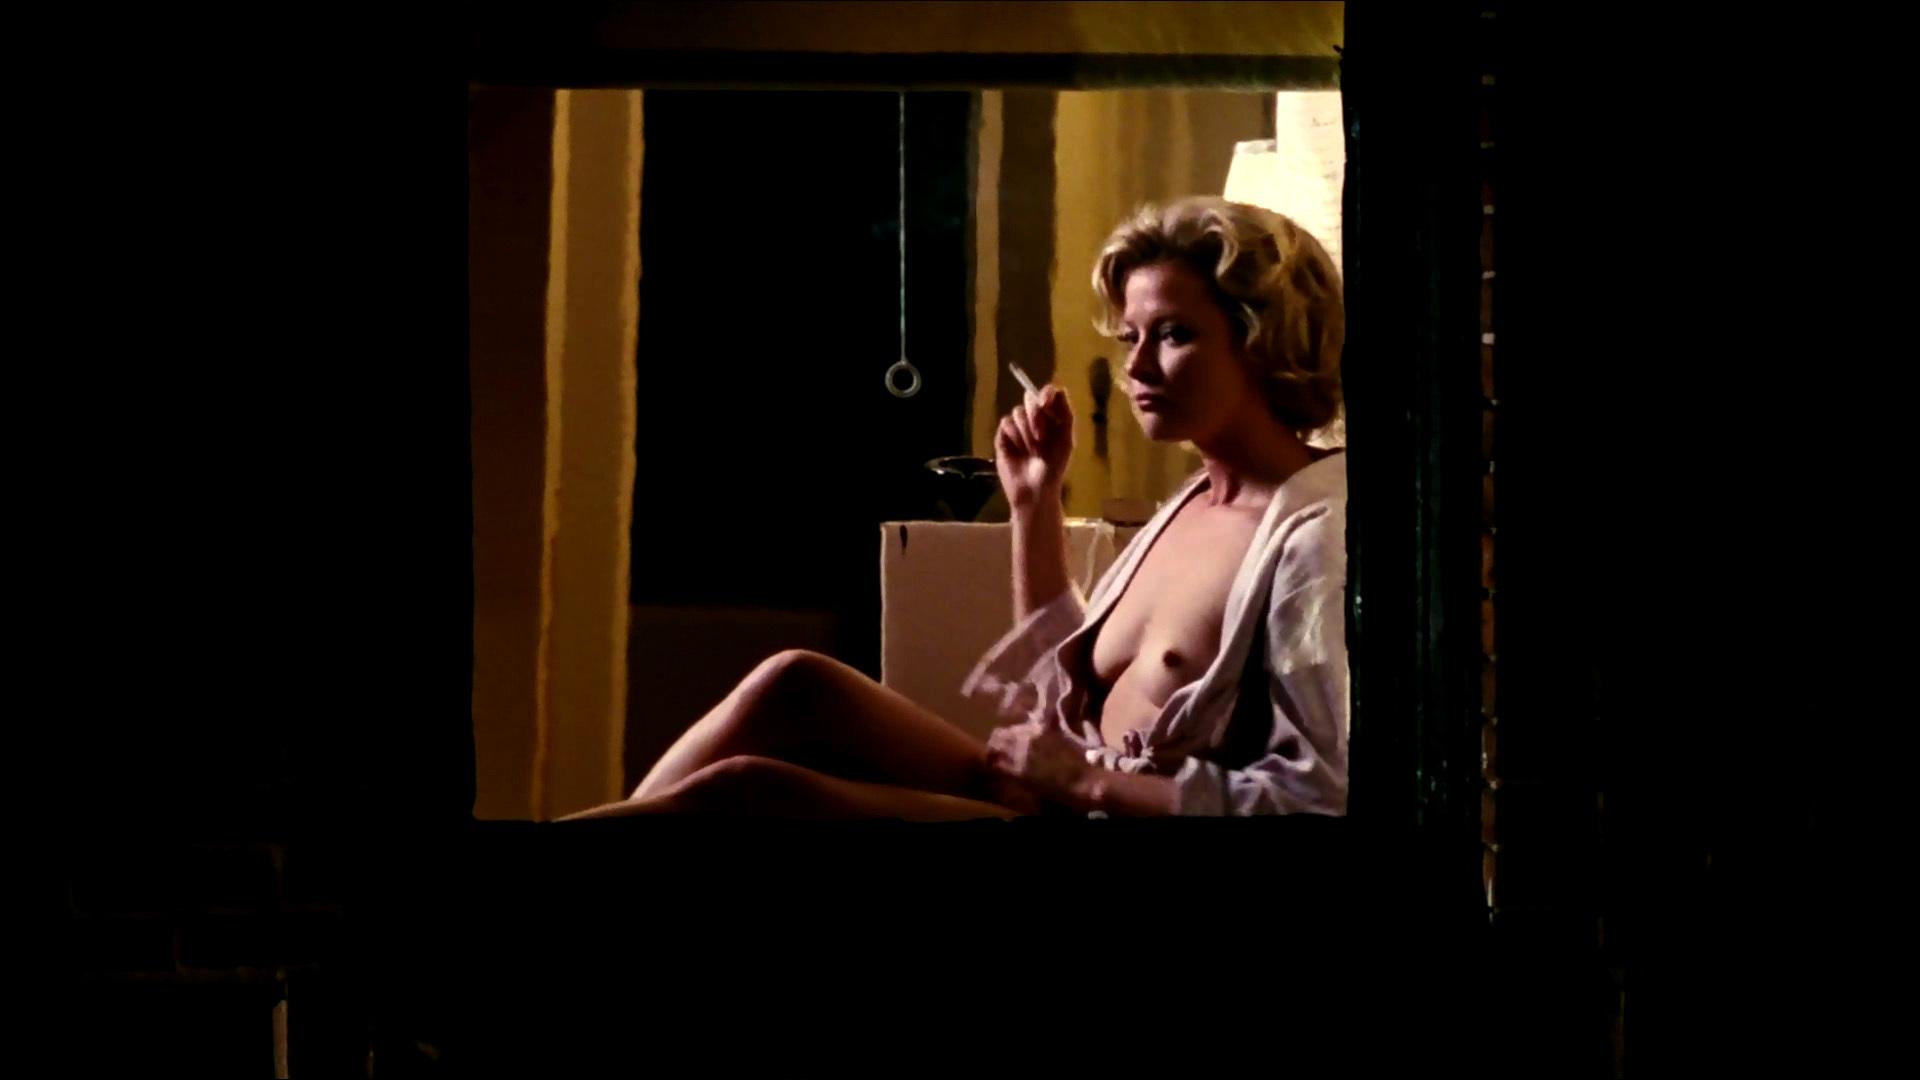 Gretchen Mol - An American Affair HD 1080p 03.jpg